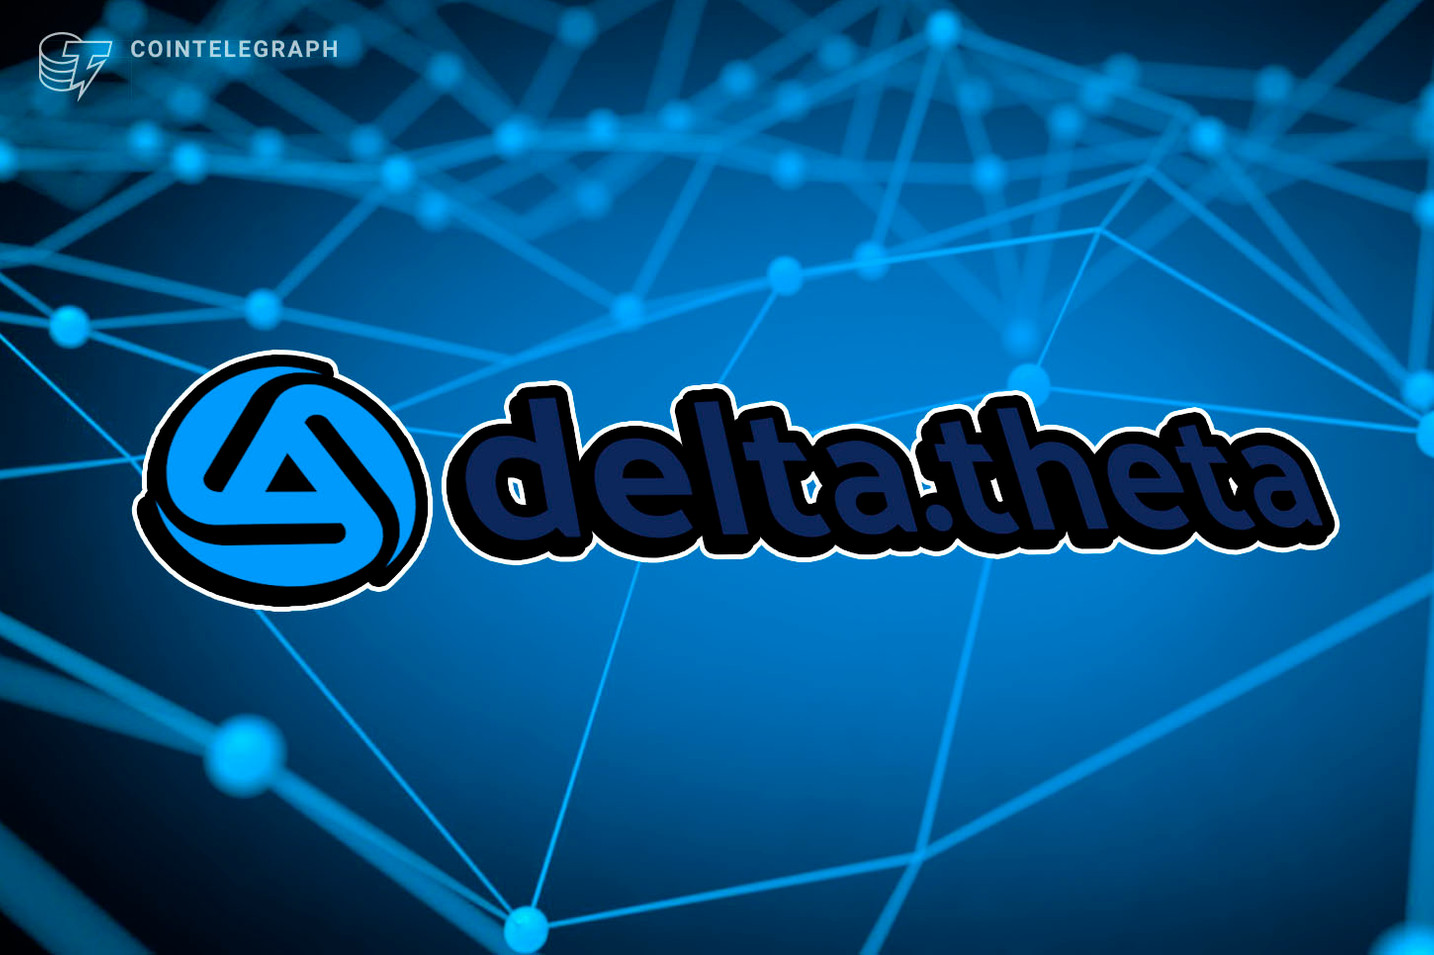 Delta.theta receives an invitation from the Miami mayor and Thundermark investment